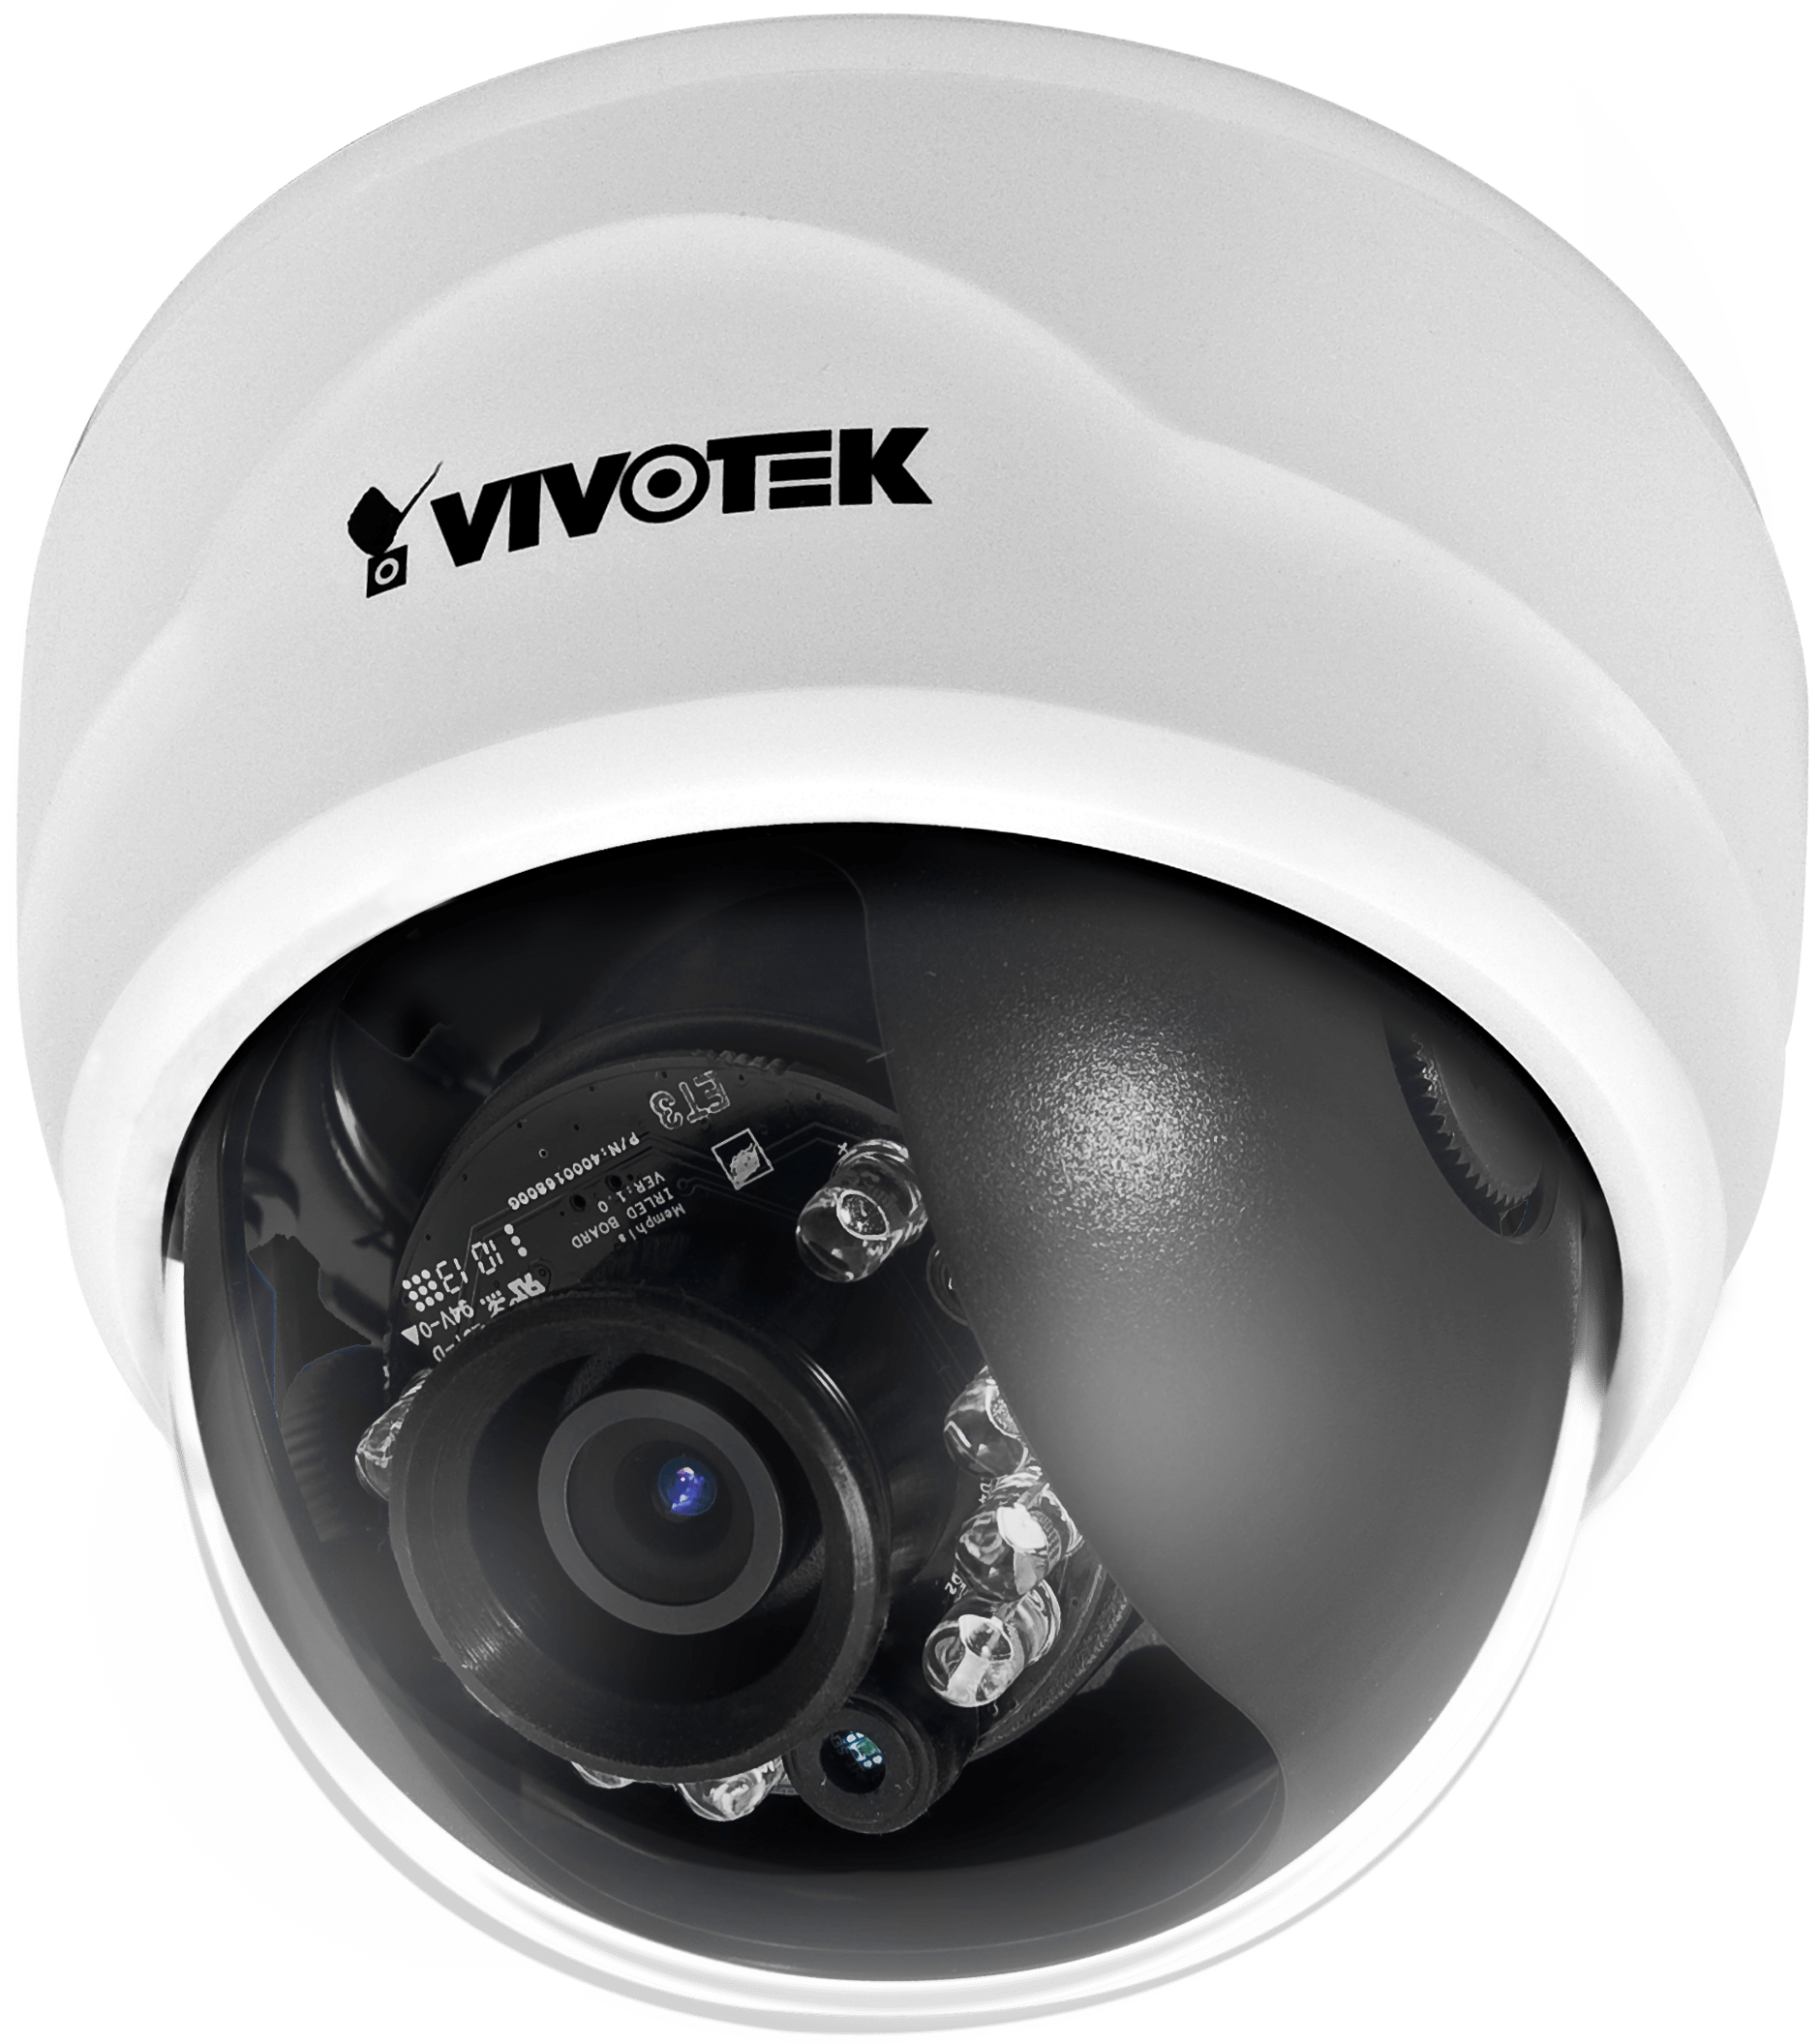 BD5115 | VIVOTEK Network Camera | H.264 | Compact Design